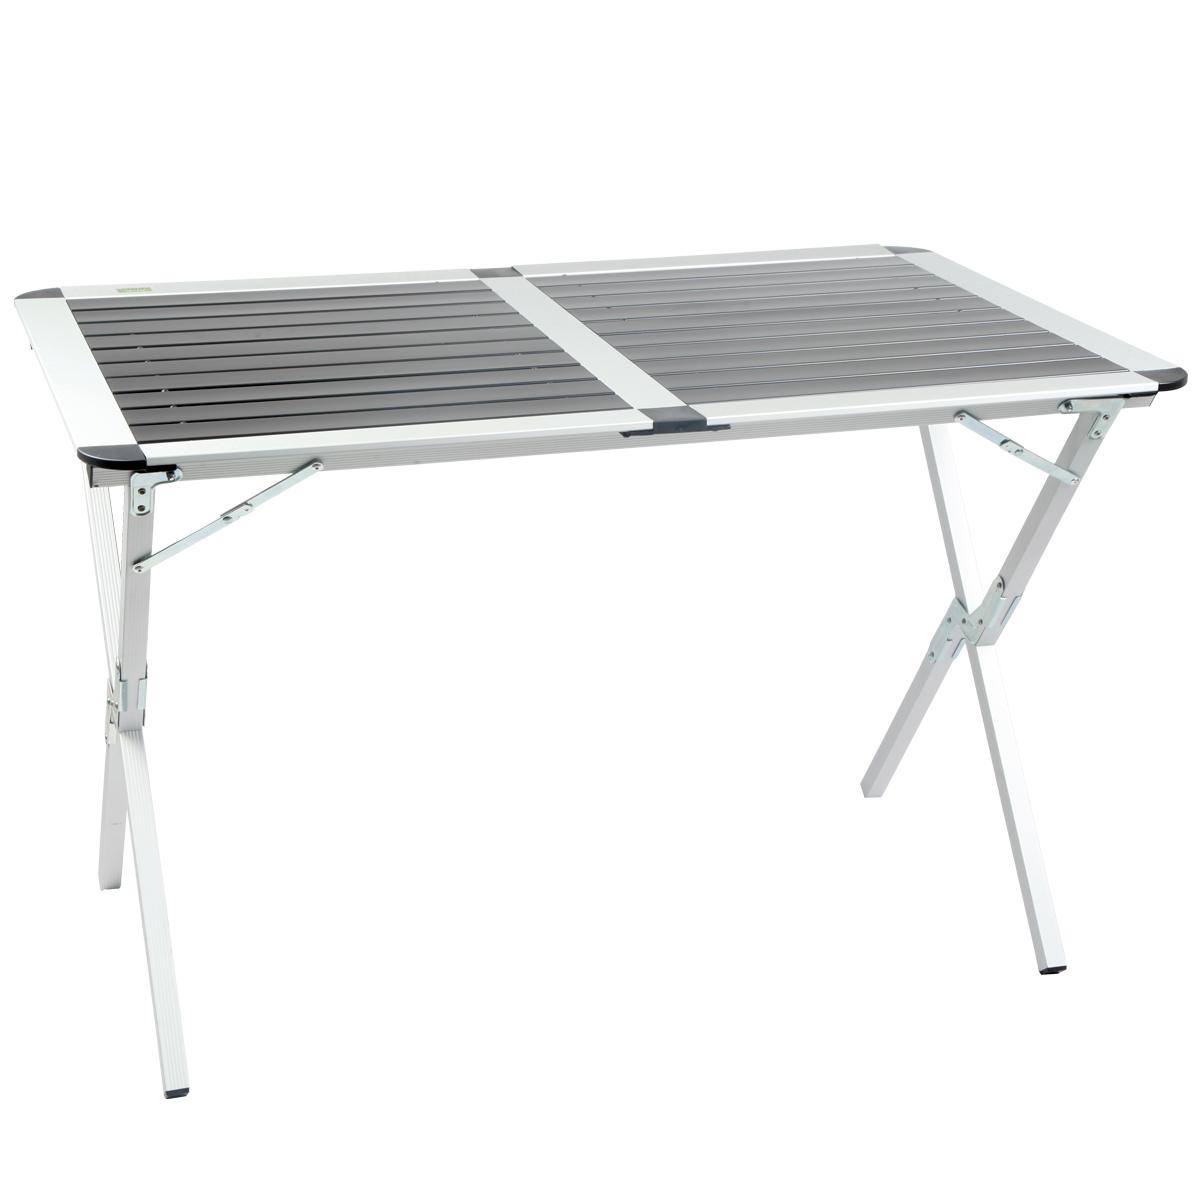 Mesa de camping waterdor aluminio reforzada tba401 1990 for Mesa de camping plegable de aluminio